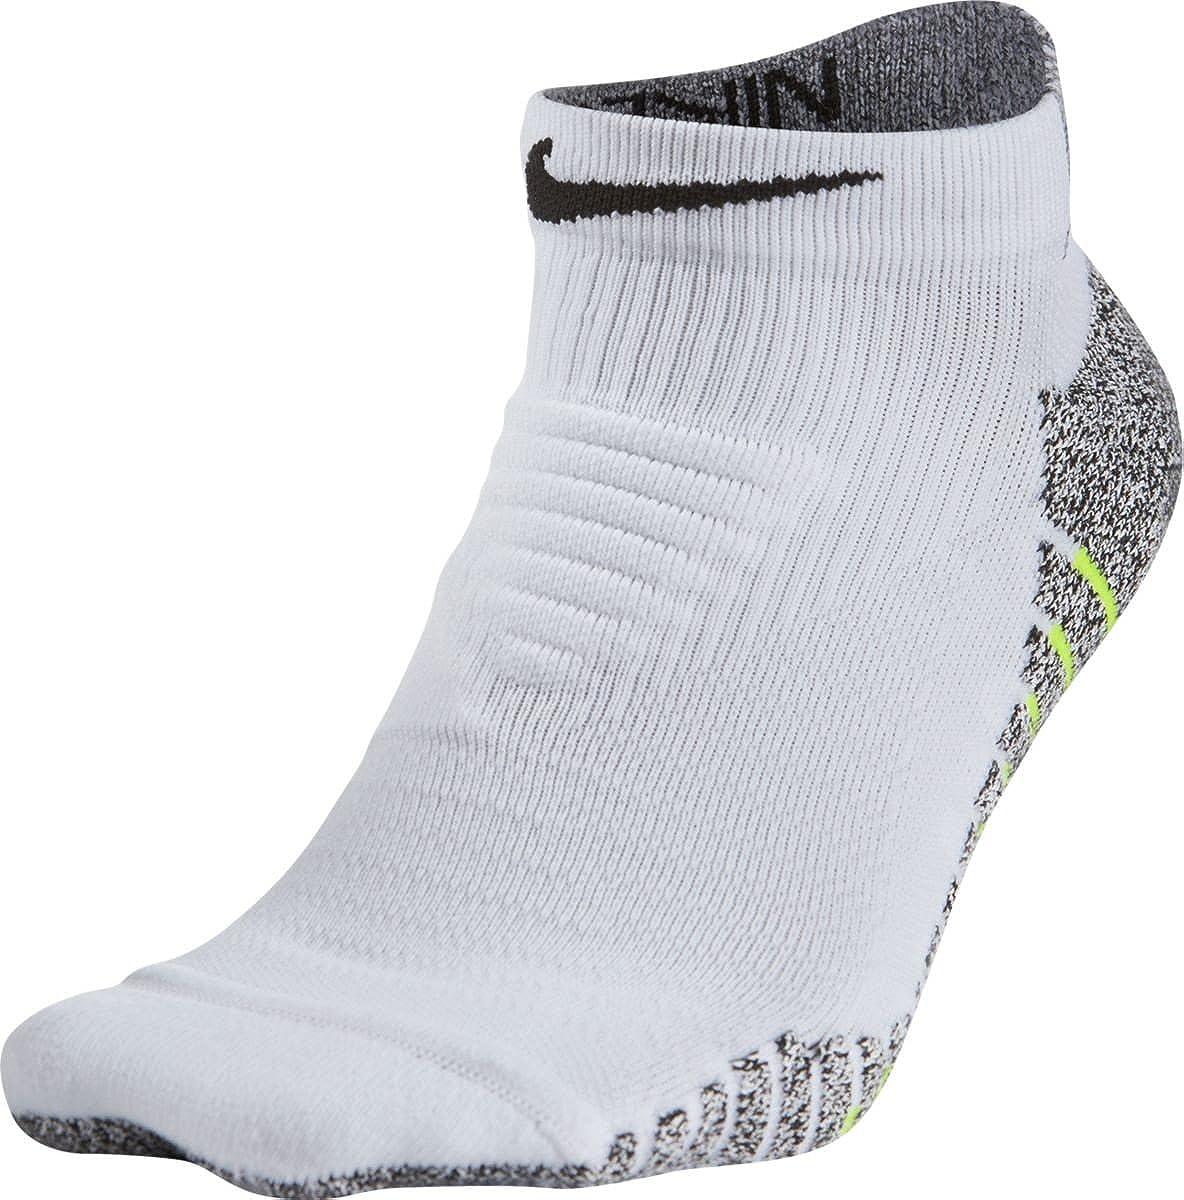 Nike Grip Men's Lightweight Low Training Socks X-Large (Fits Men Size 12-15) White, Black SX5751-100